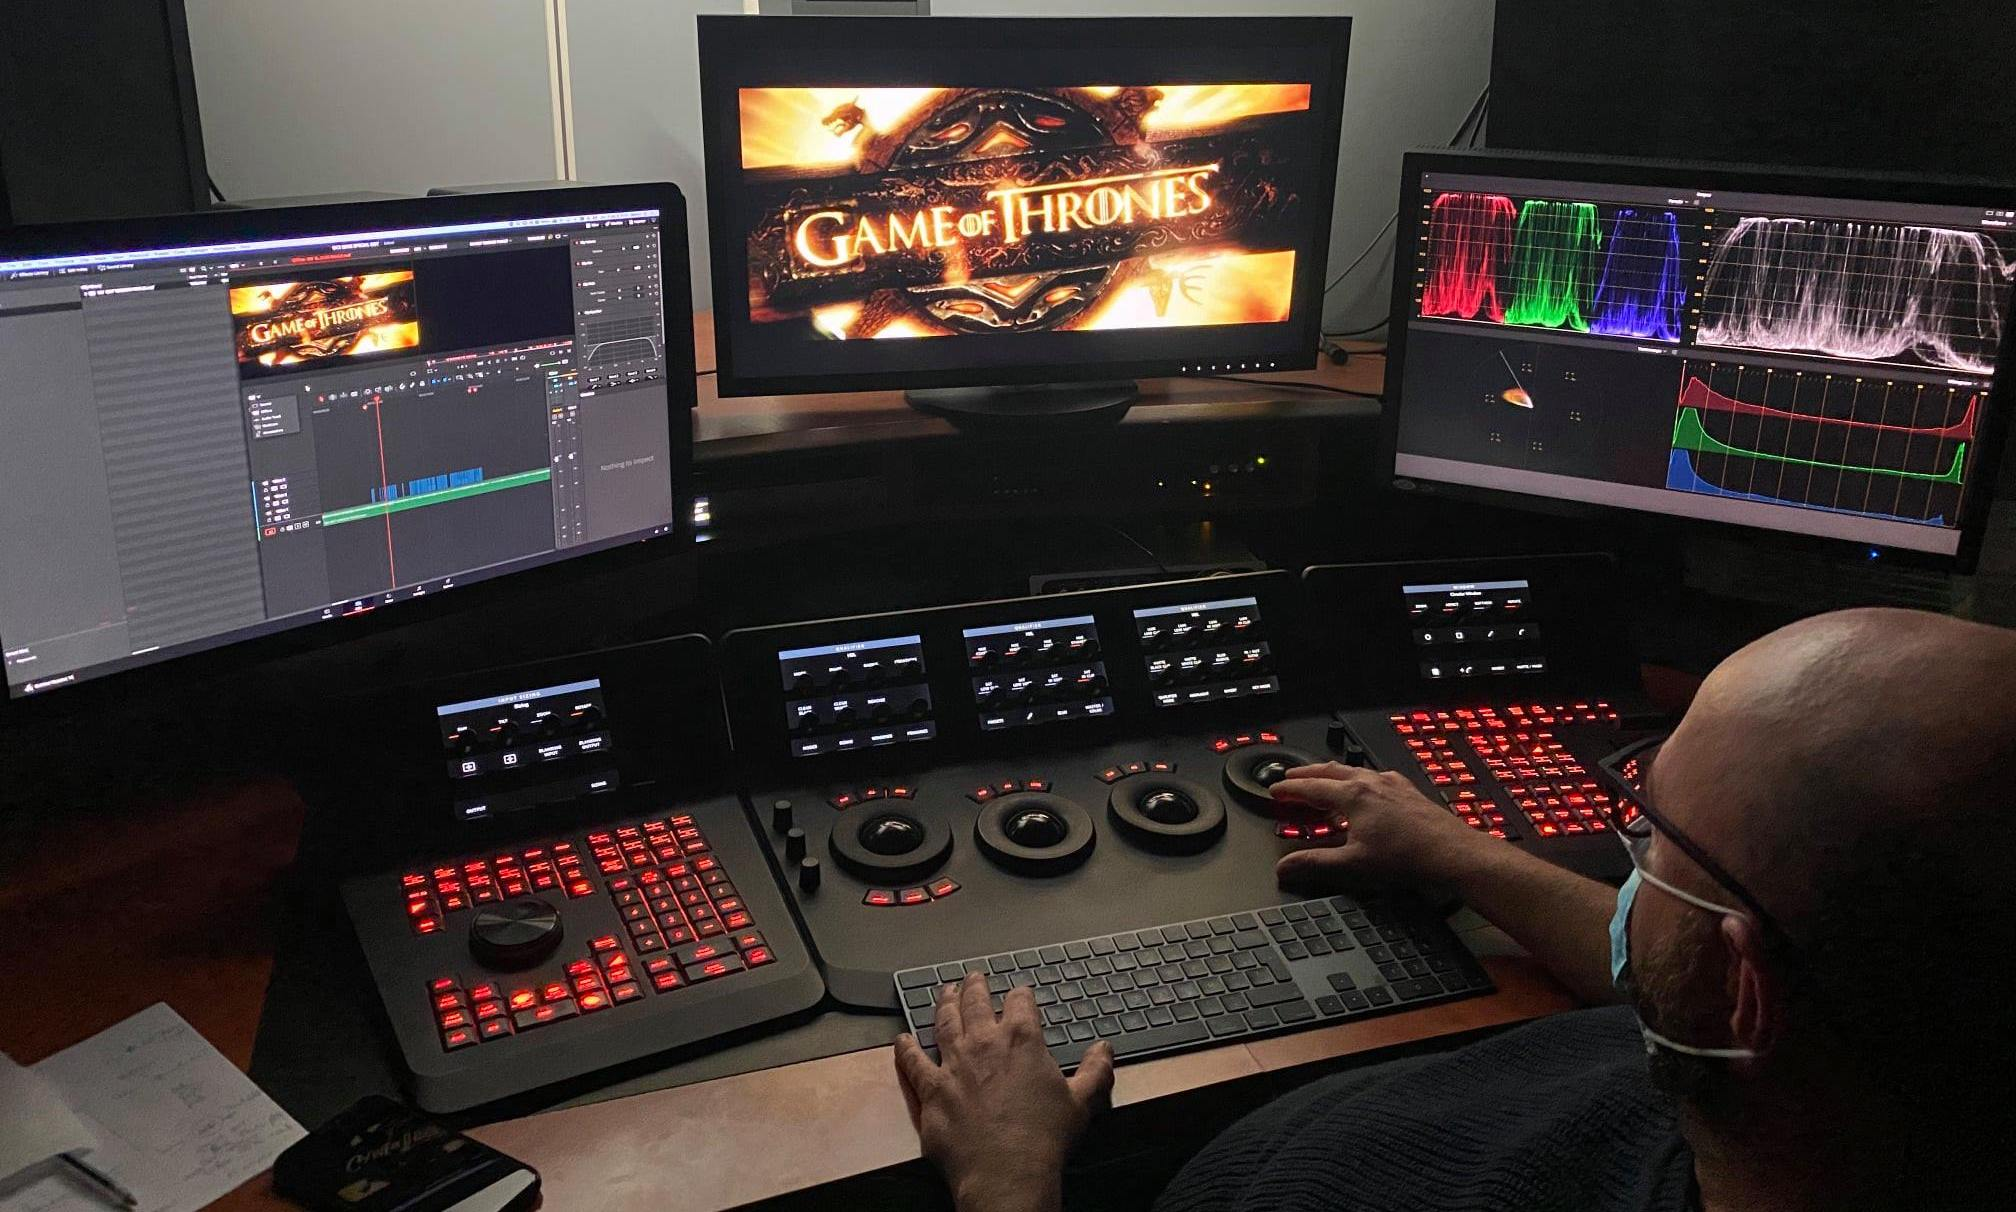 Programme spécial «Game of Thrones» sur OCS